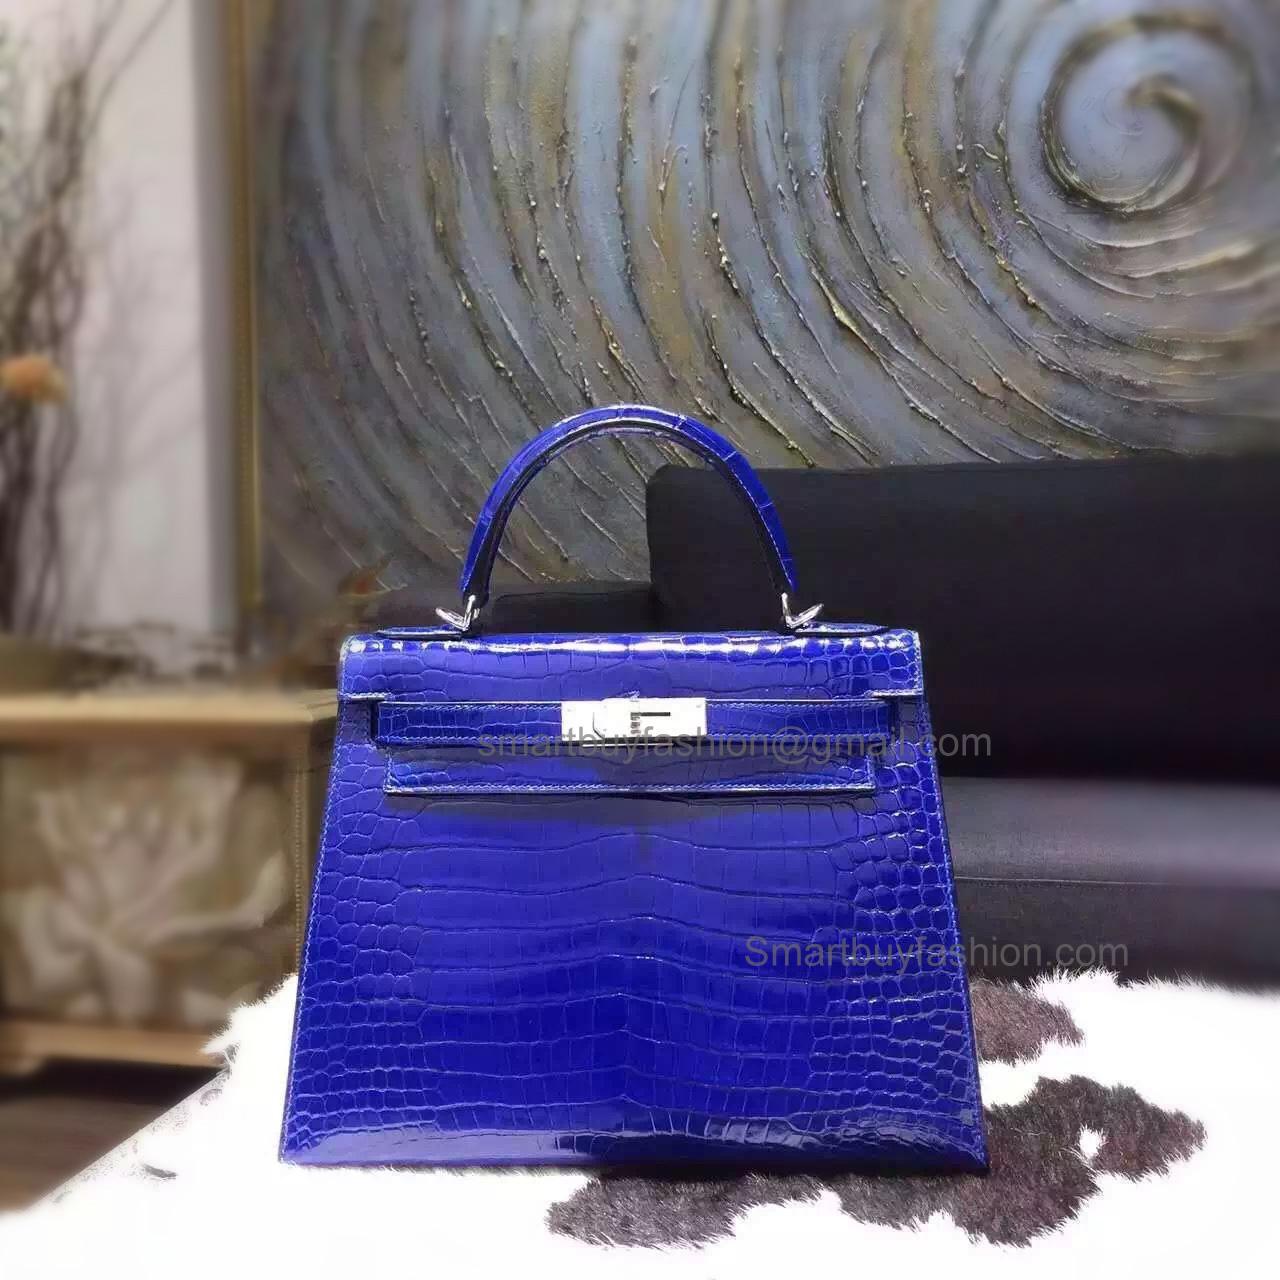 64f86b8fee03 Replica Hermes Kelly 28 Bag in 7t Blue Electric Shining Porosus Crocodile  SHW ·  8